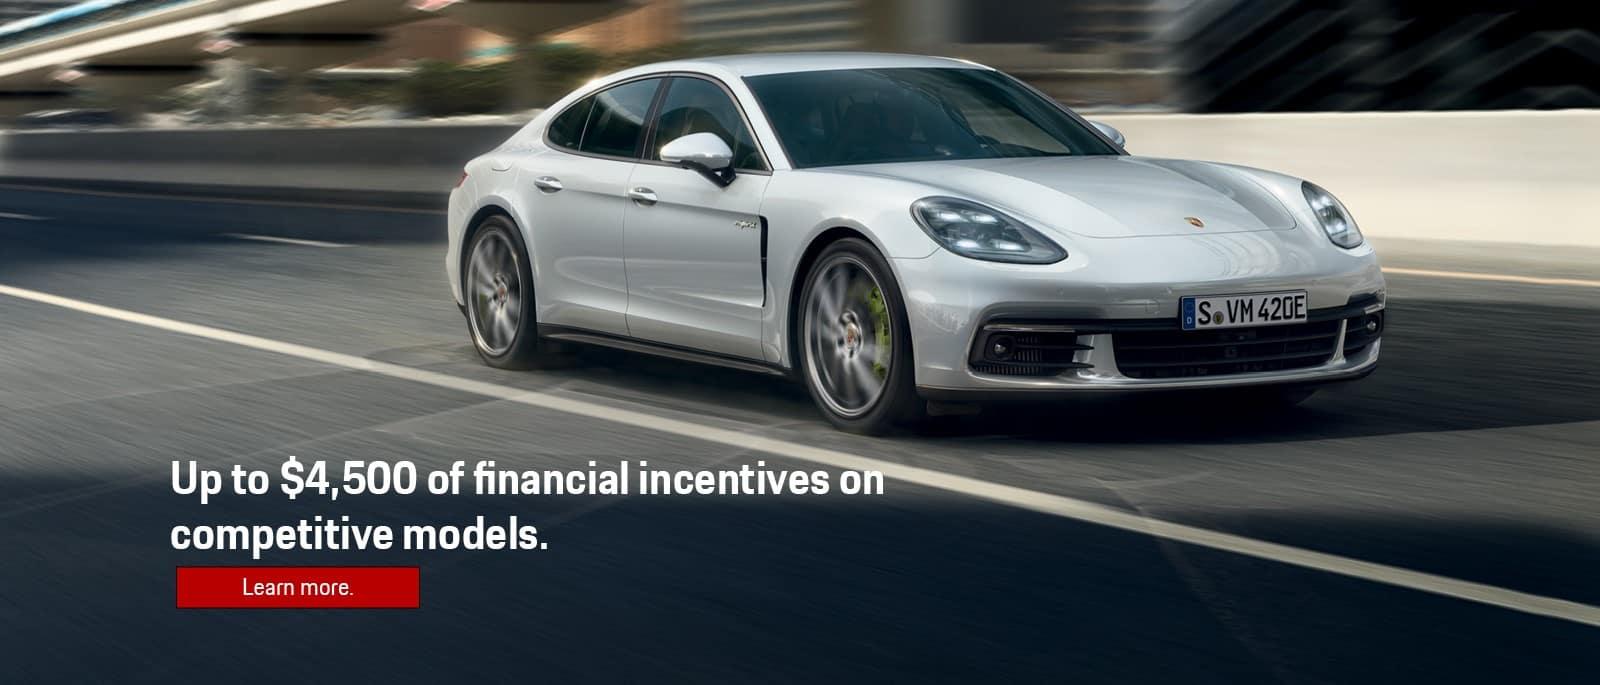 Porsche Competitive Models Financial Incentives